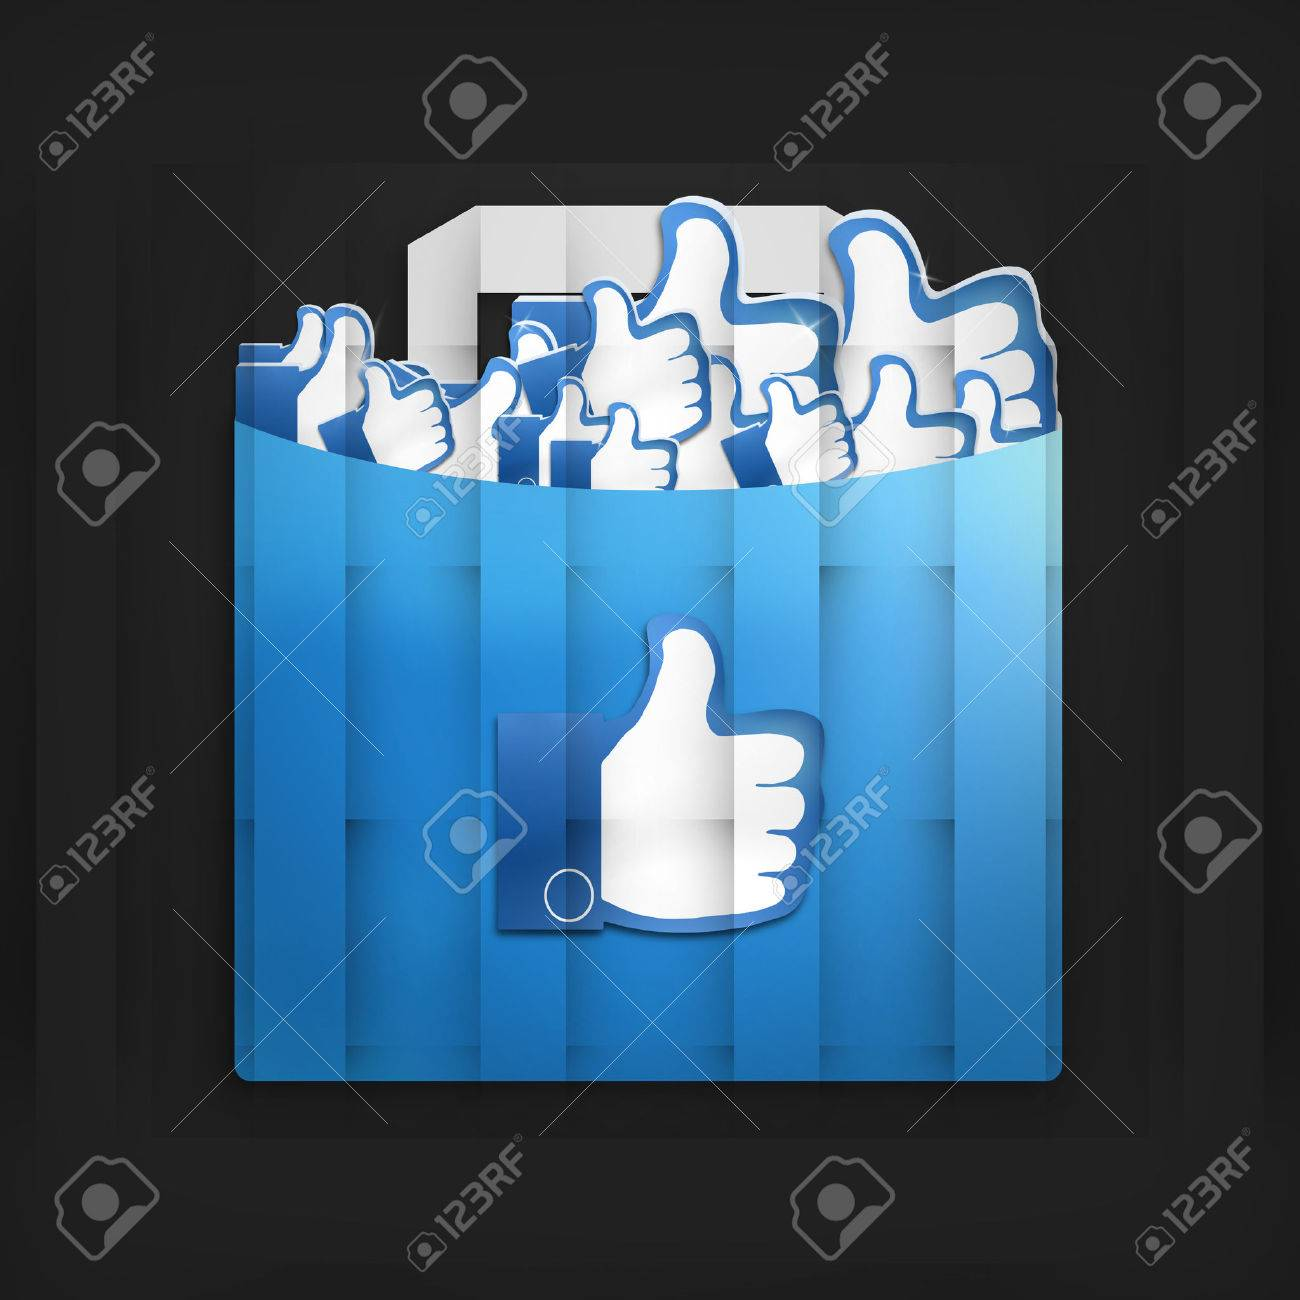 Thumbs Up Social Media Design - 29601314